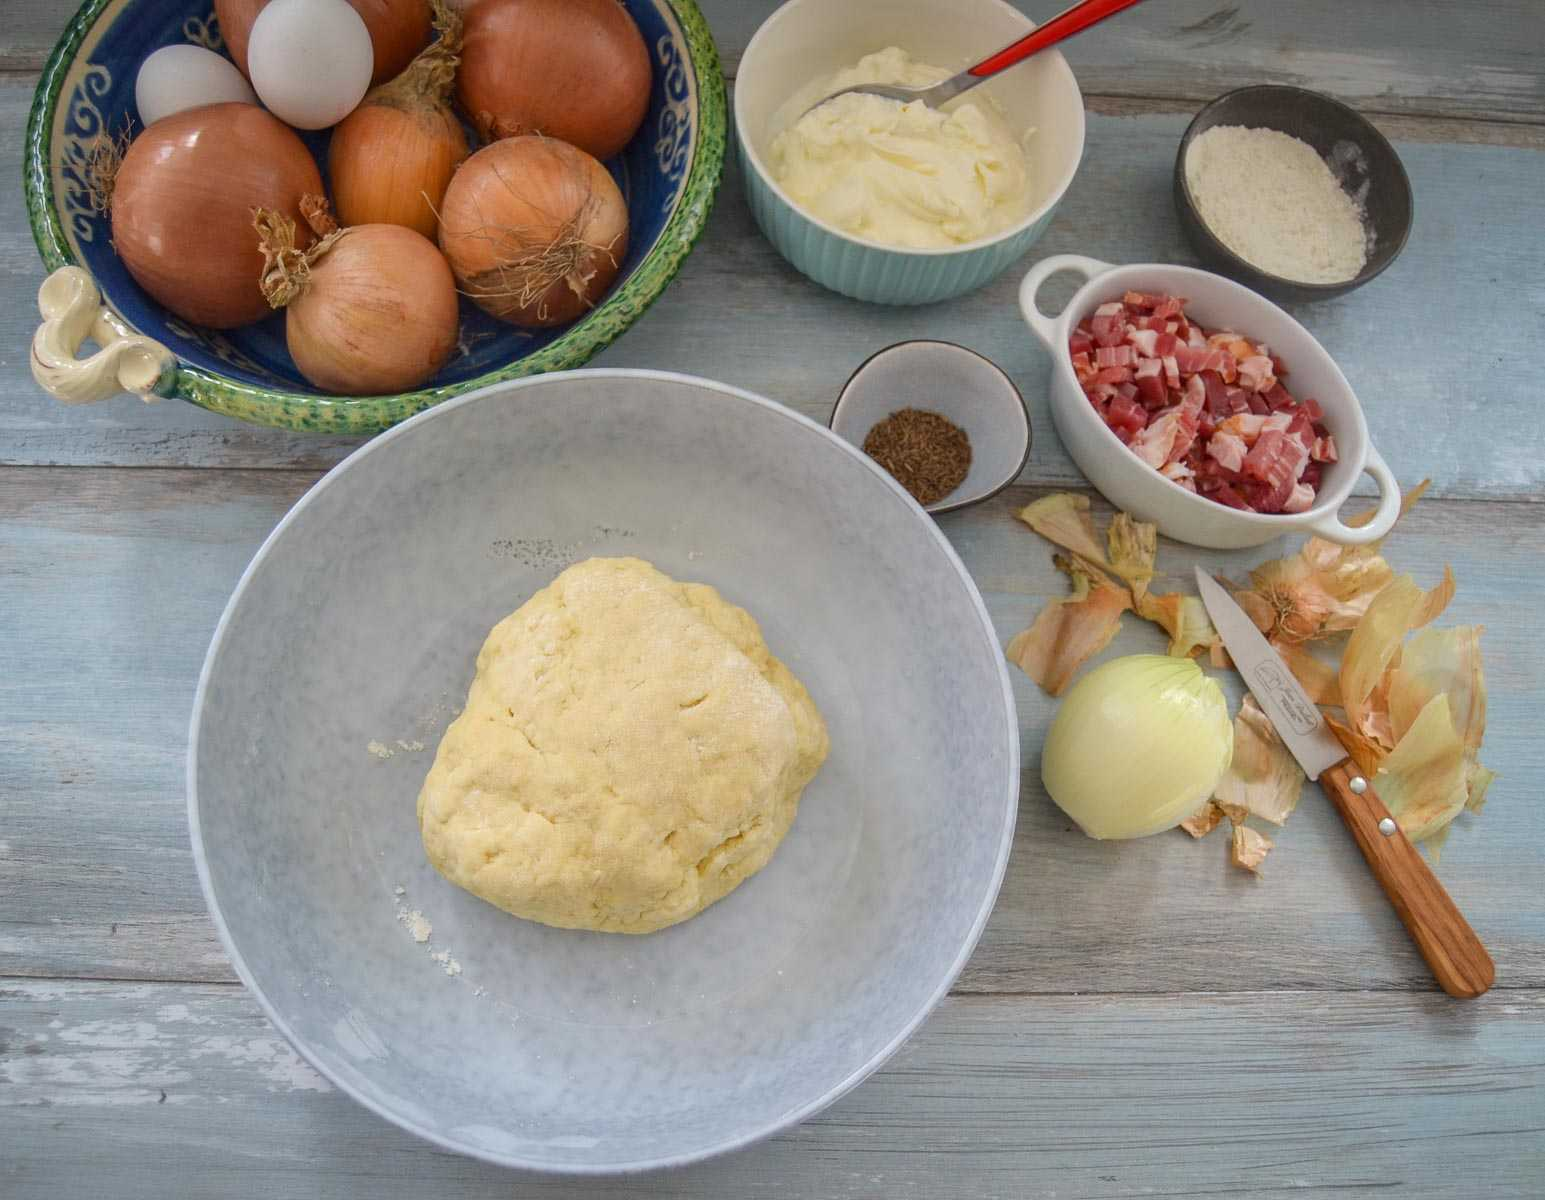 Zutaten Hefeteig, Eier, Speck, Zwiebeln, saure Sahne, Salz Pfeffer Kümmel